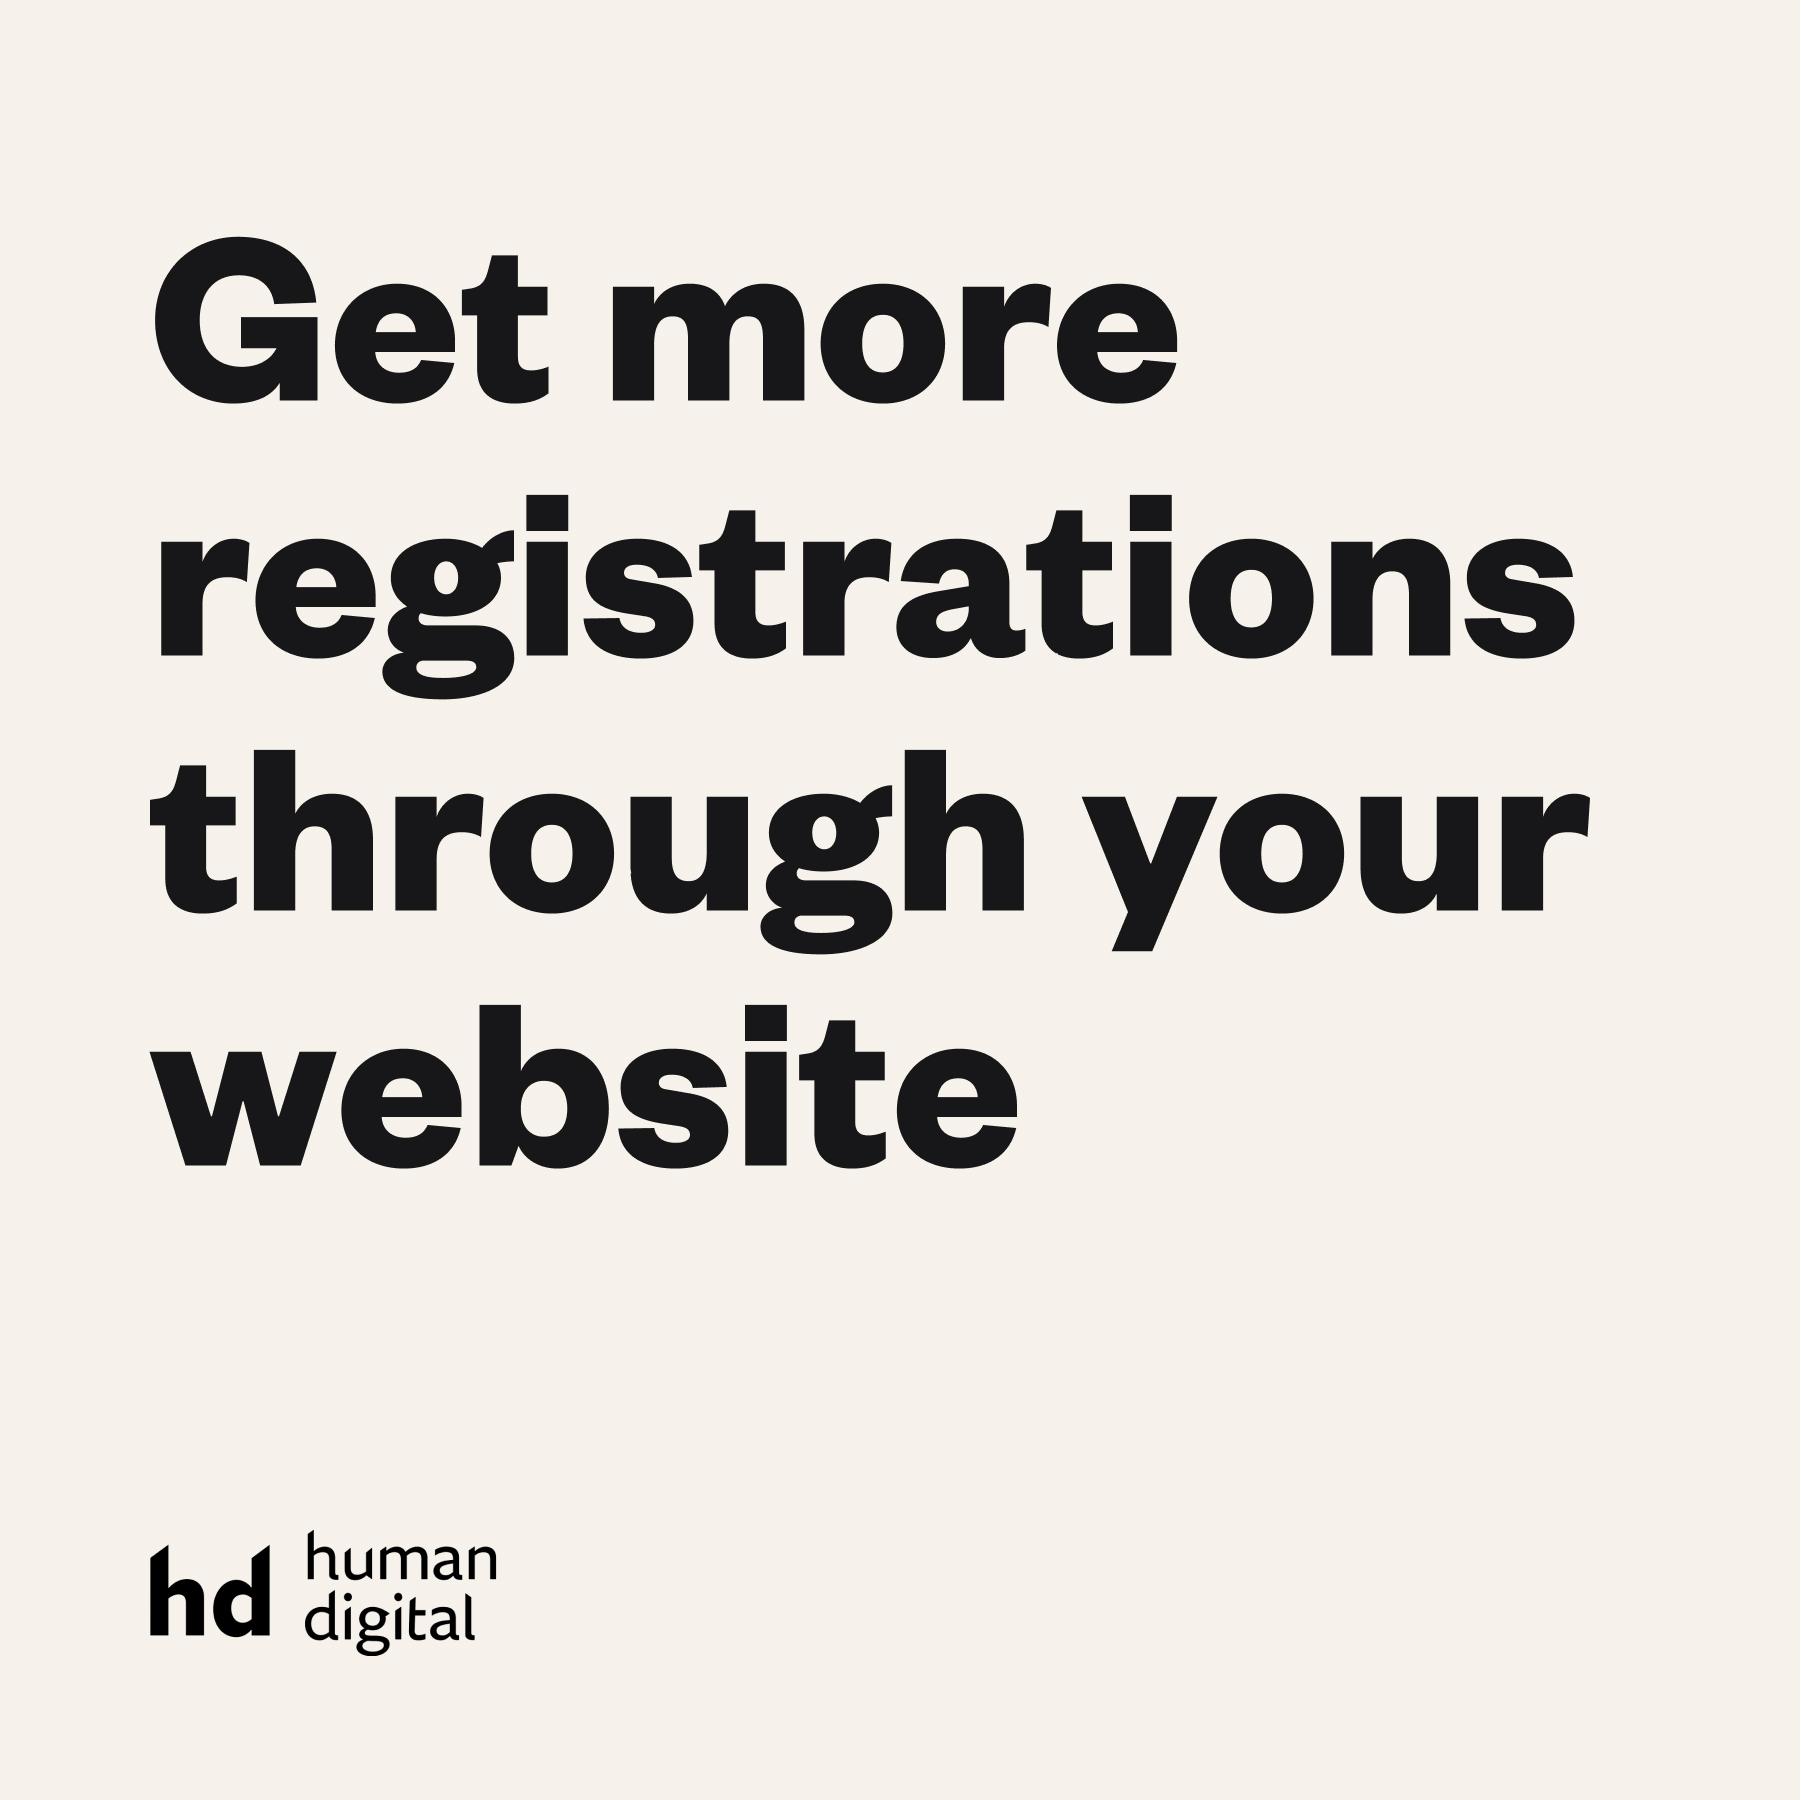 Get more registrations through your website